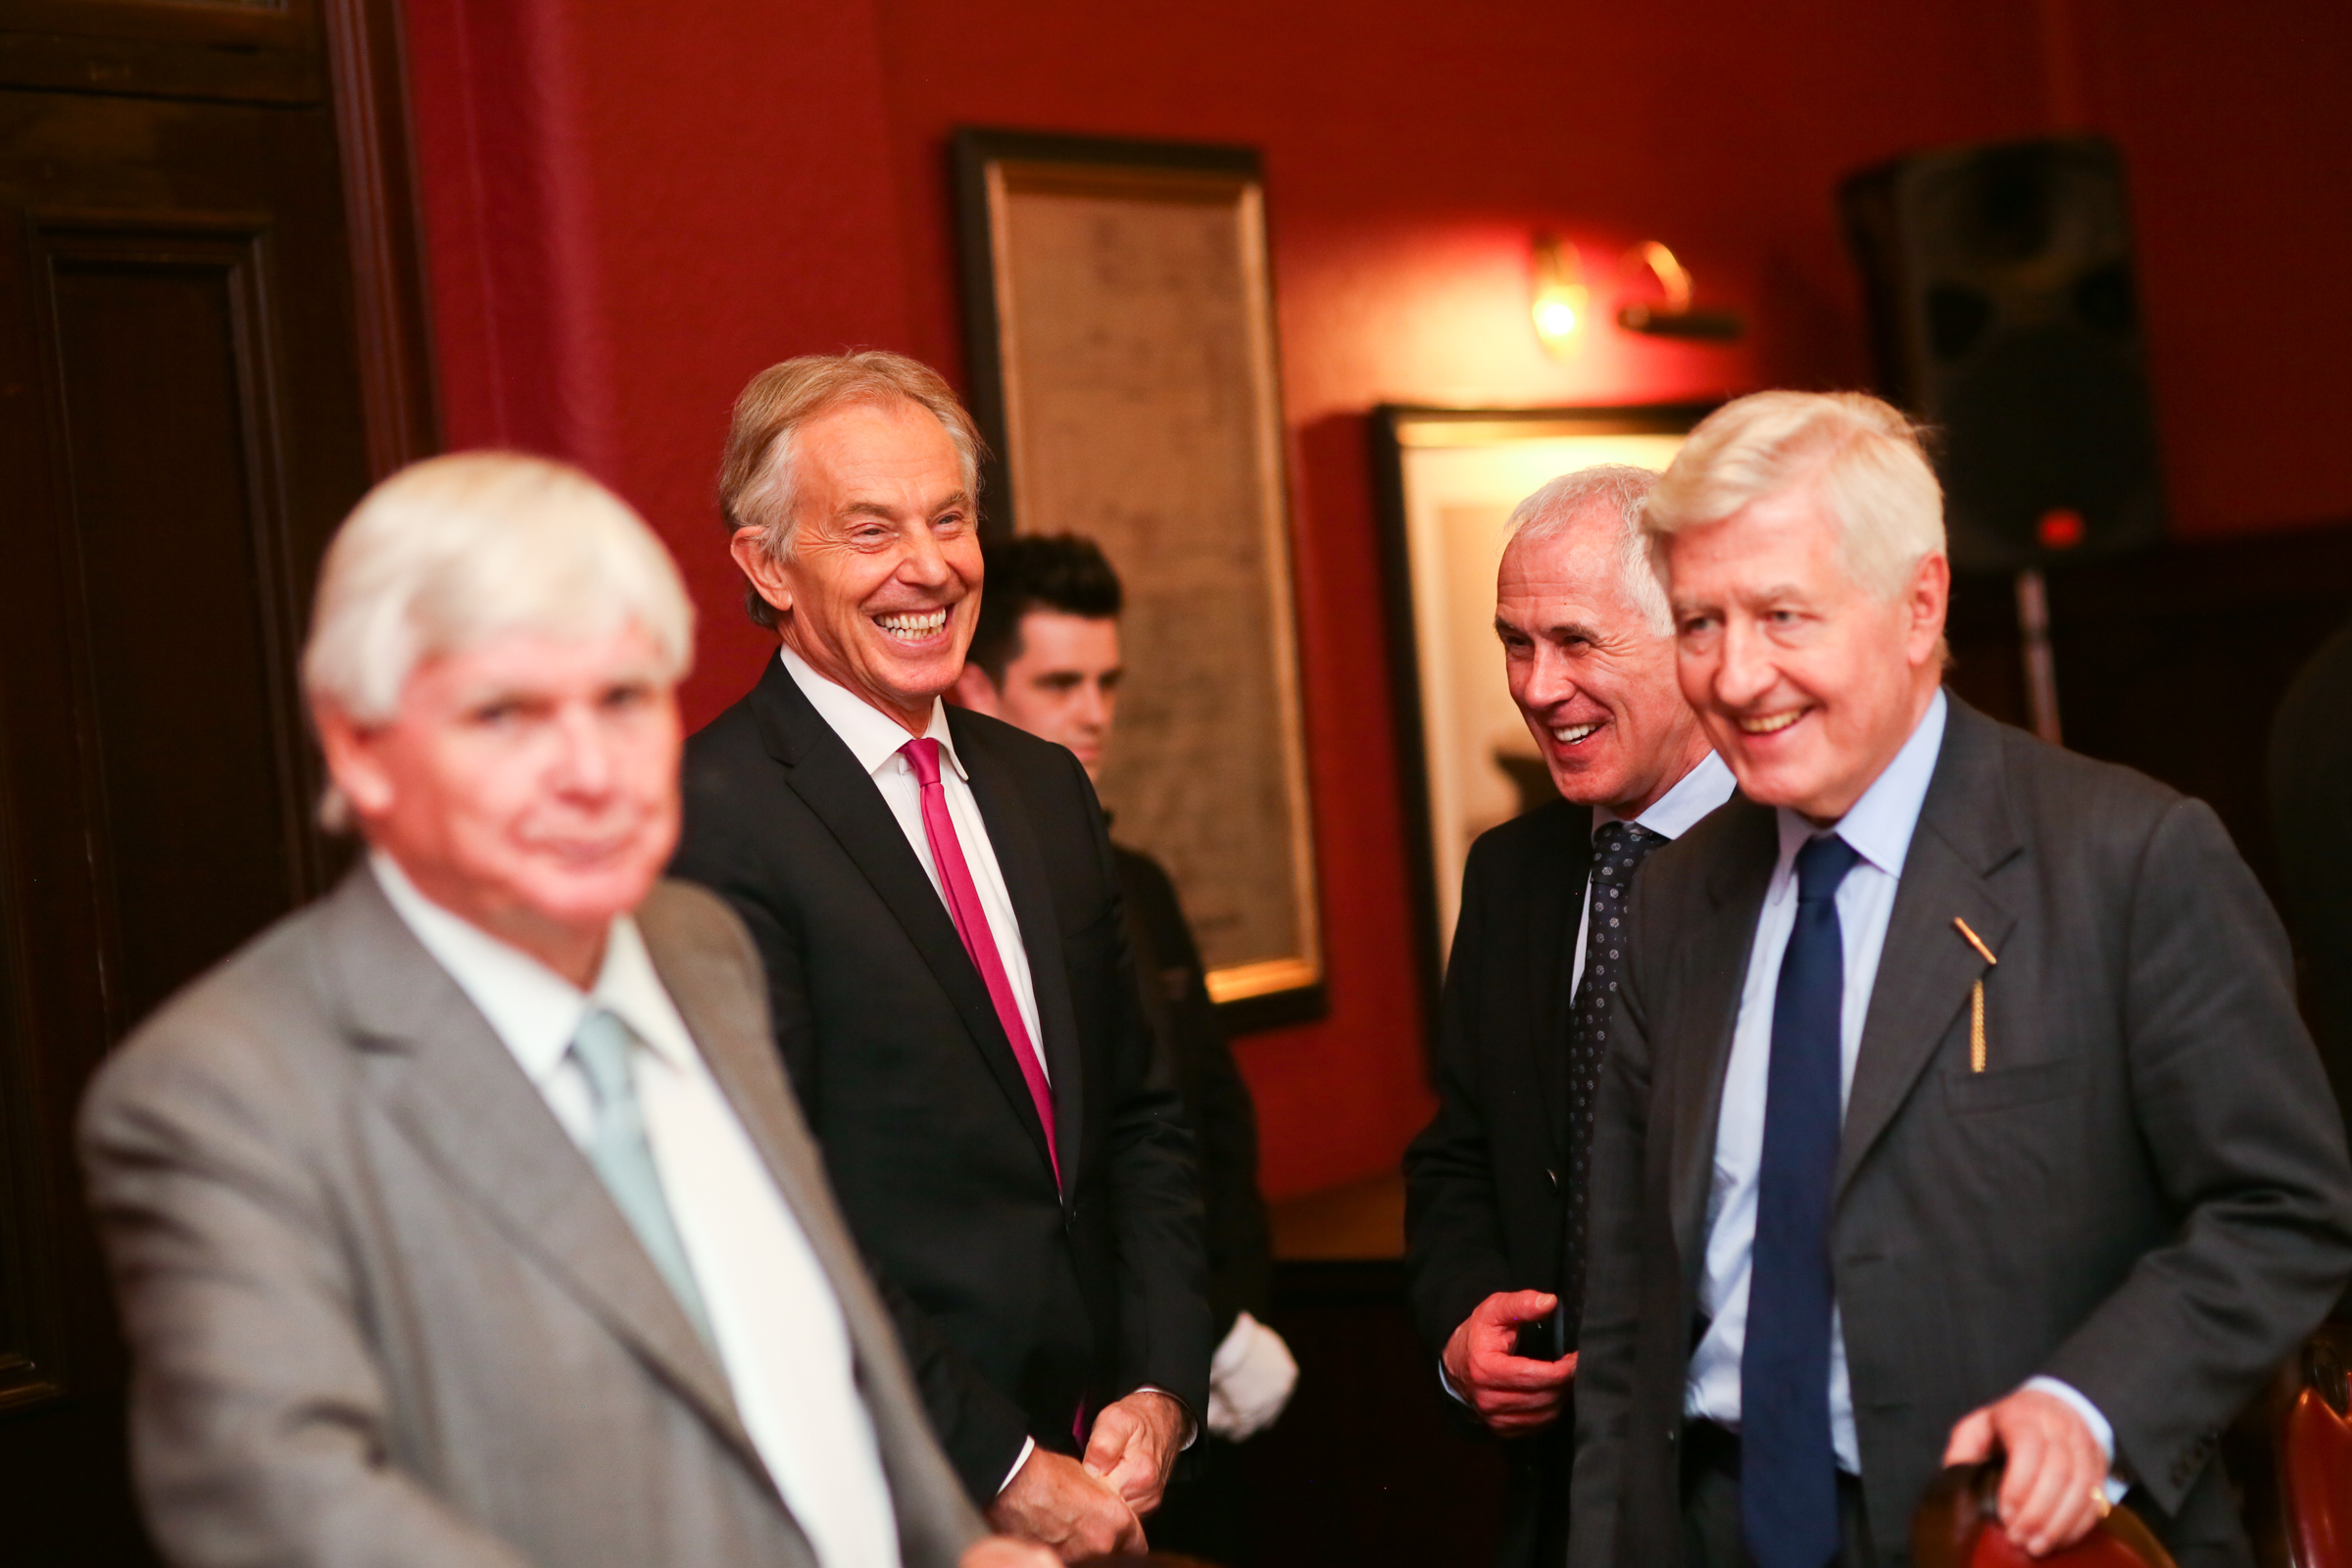 Tony Blair jokes with Co-operation Ireland chairman Christopher Moran